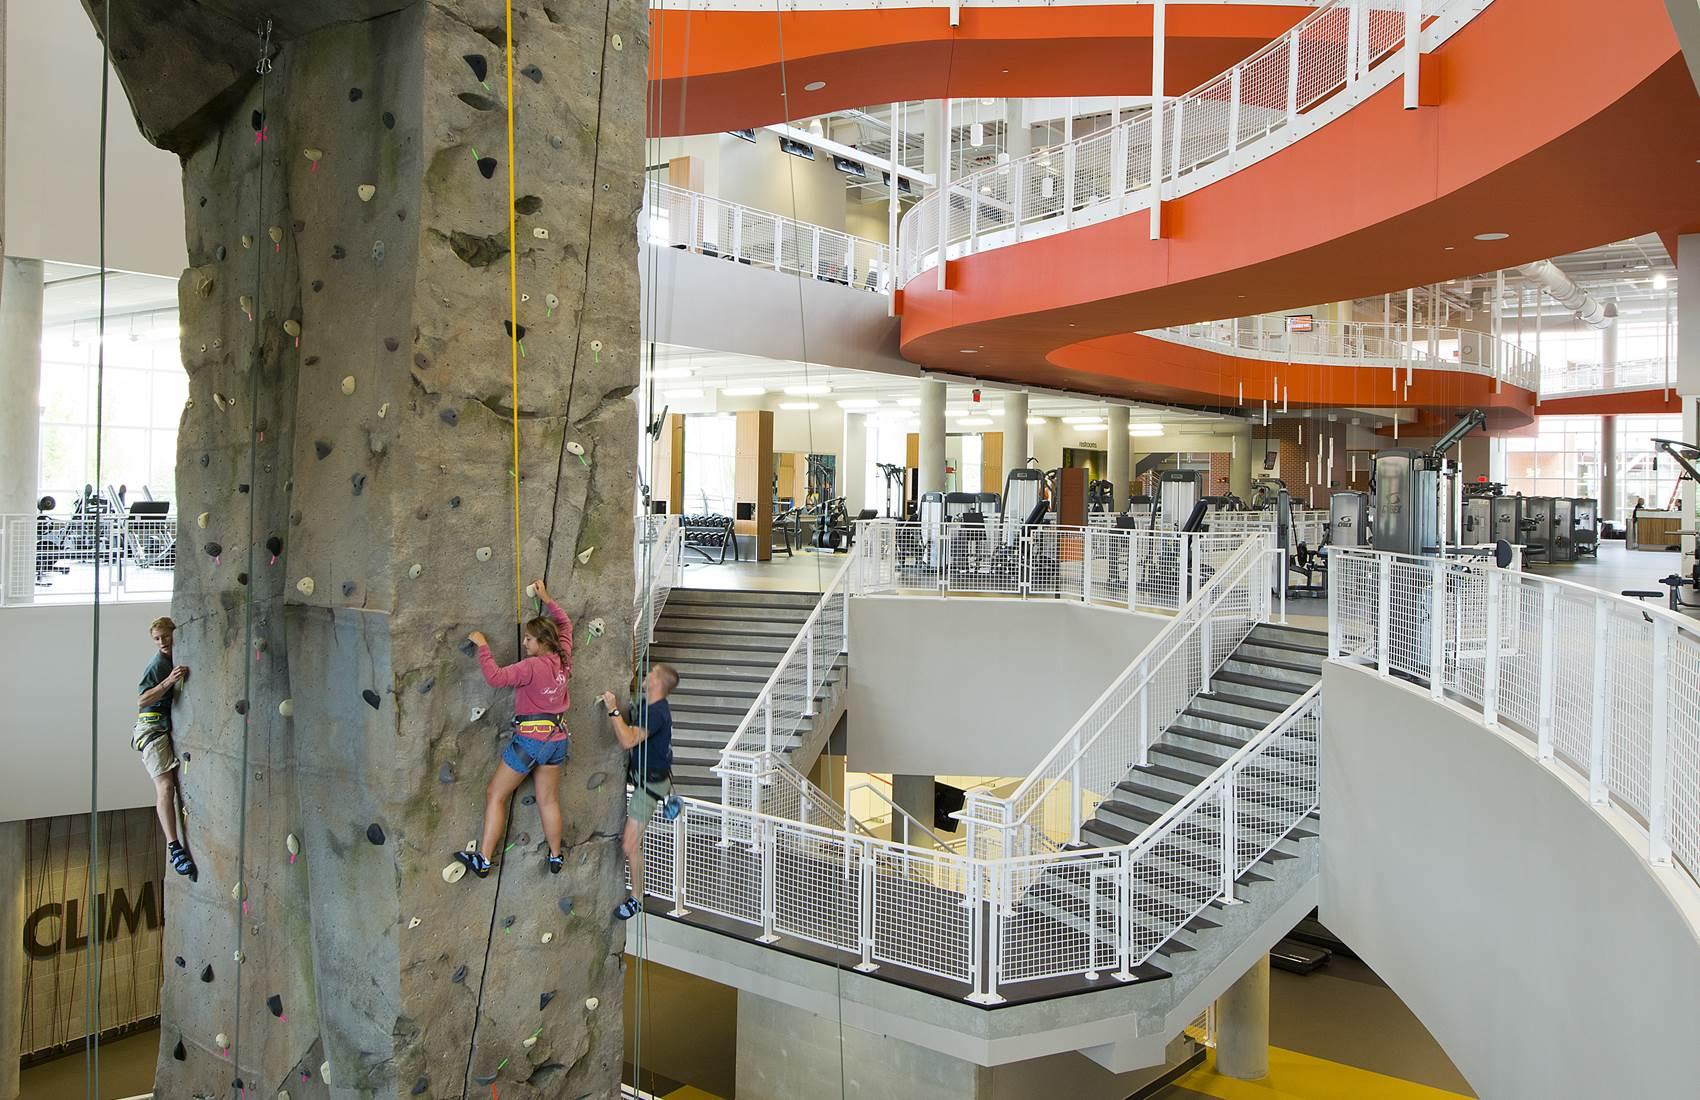 Climbing Wall at the Auburn University Recreation and Wellness Center